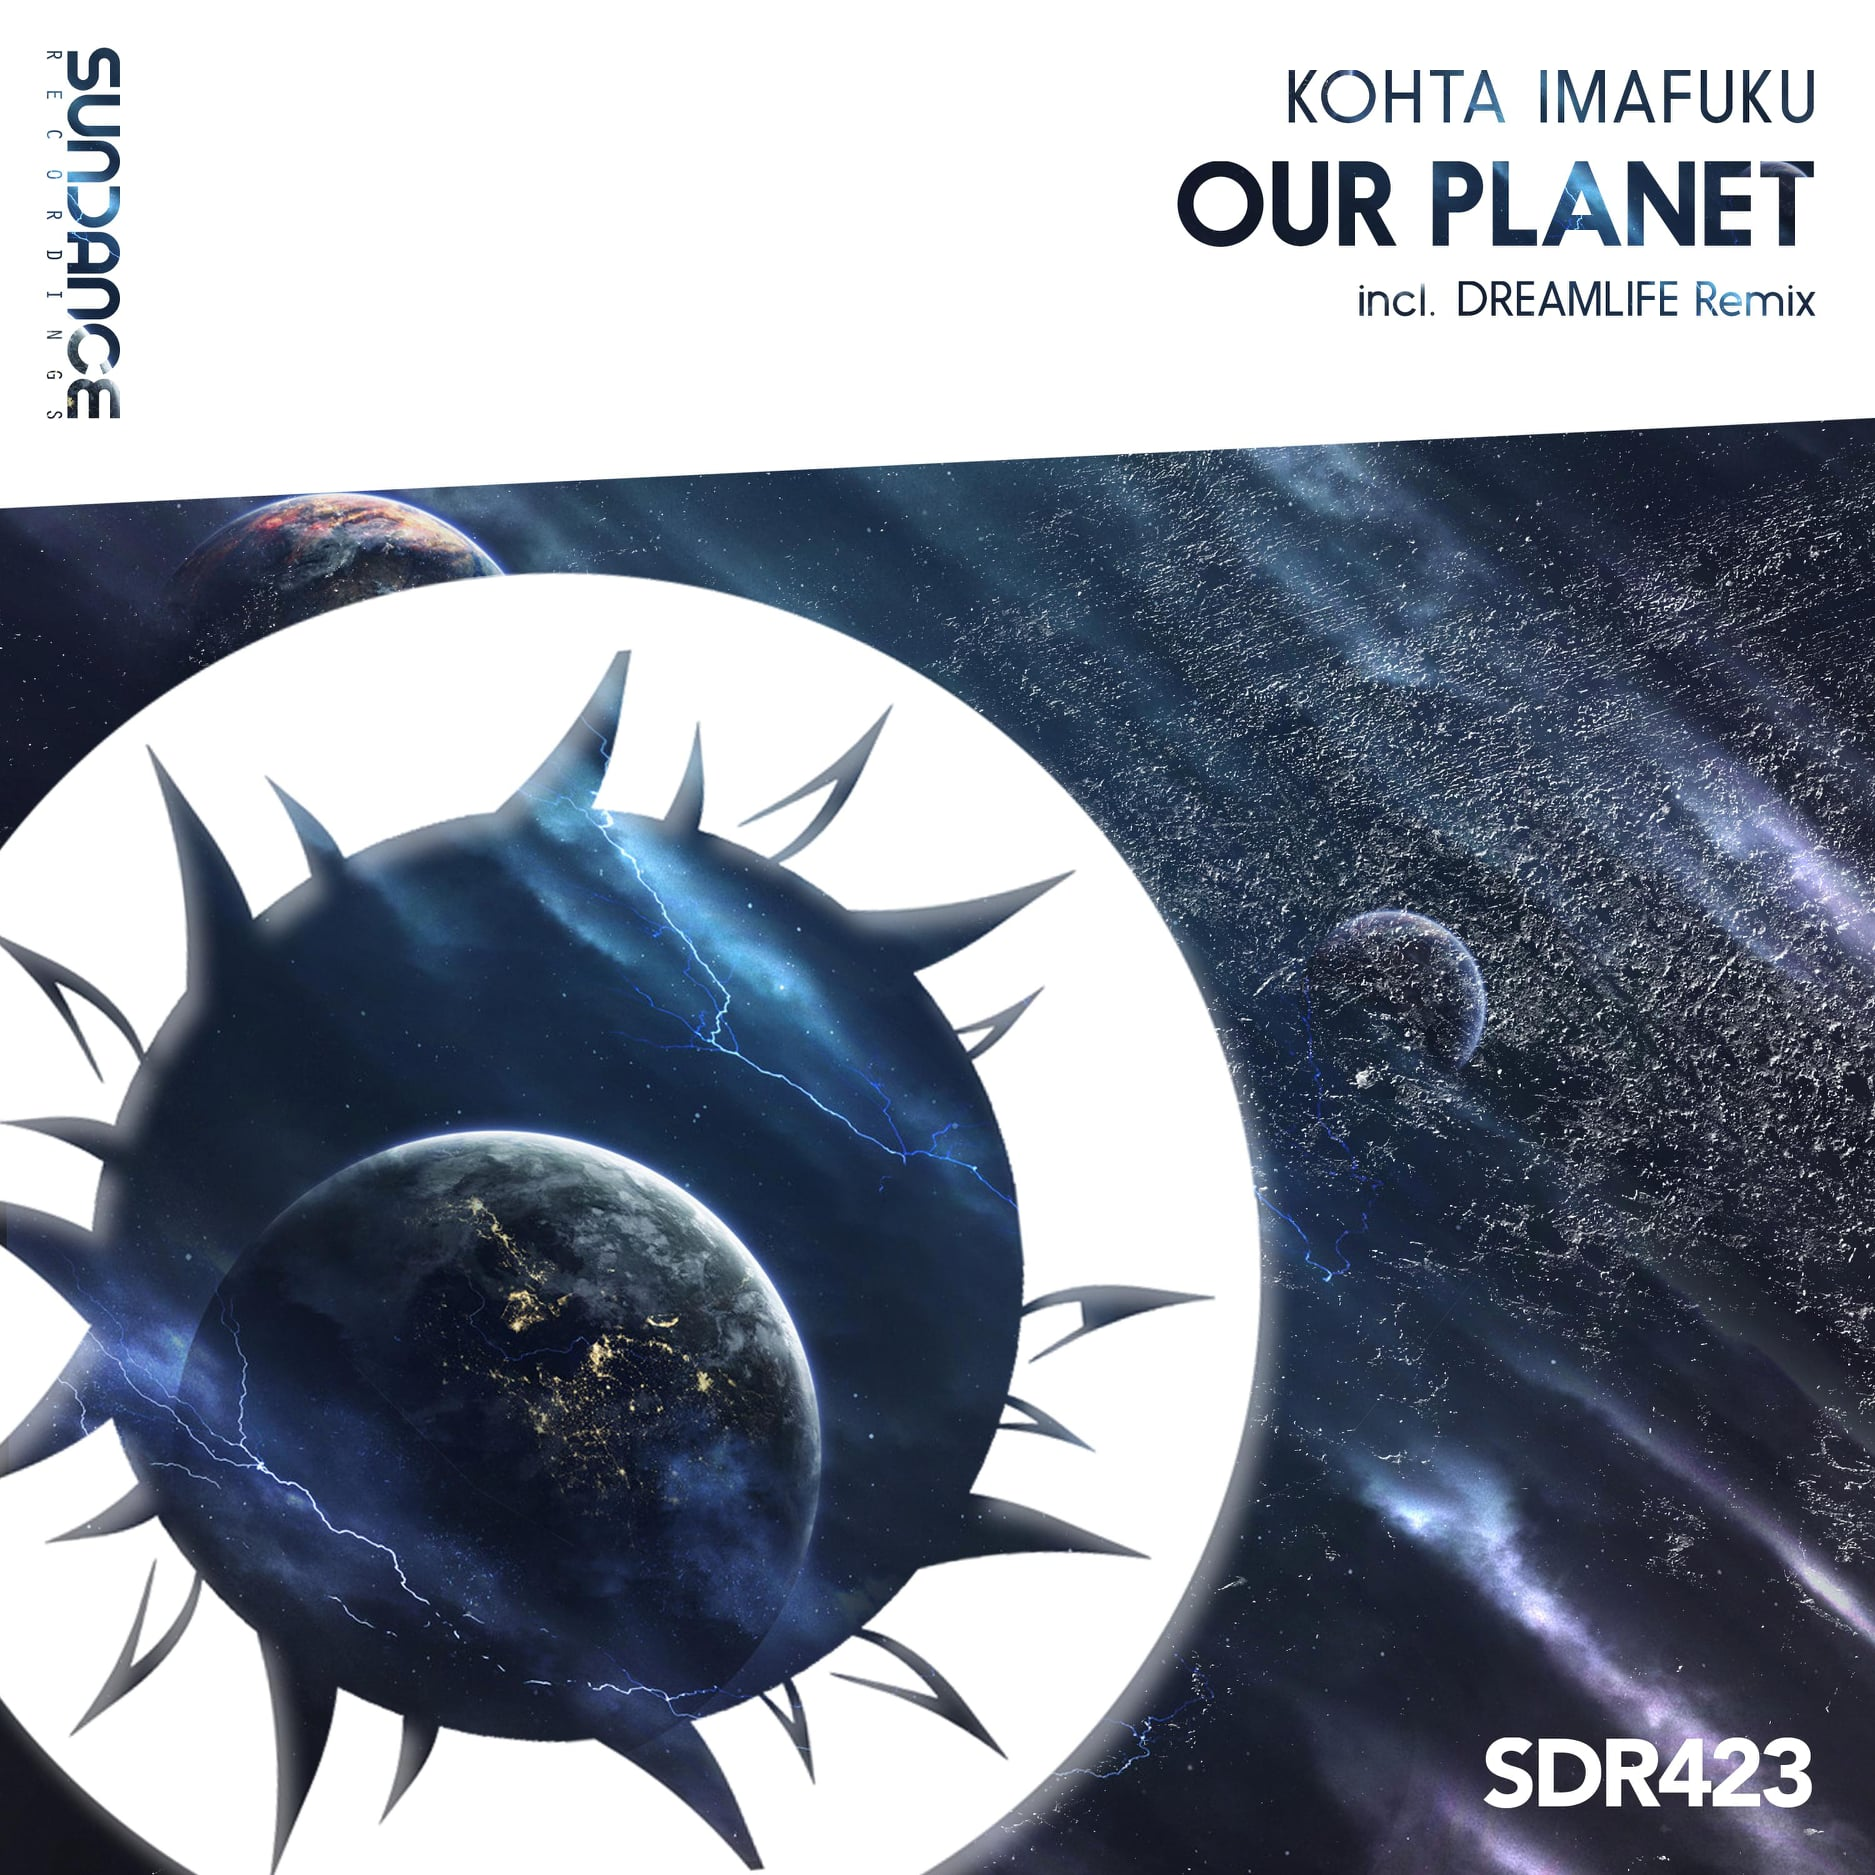 Kohta Imafuku - Our Planet (DreamLife Remix)